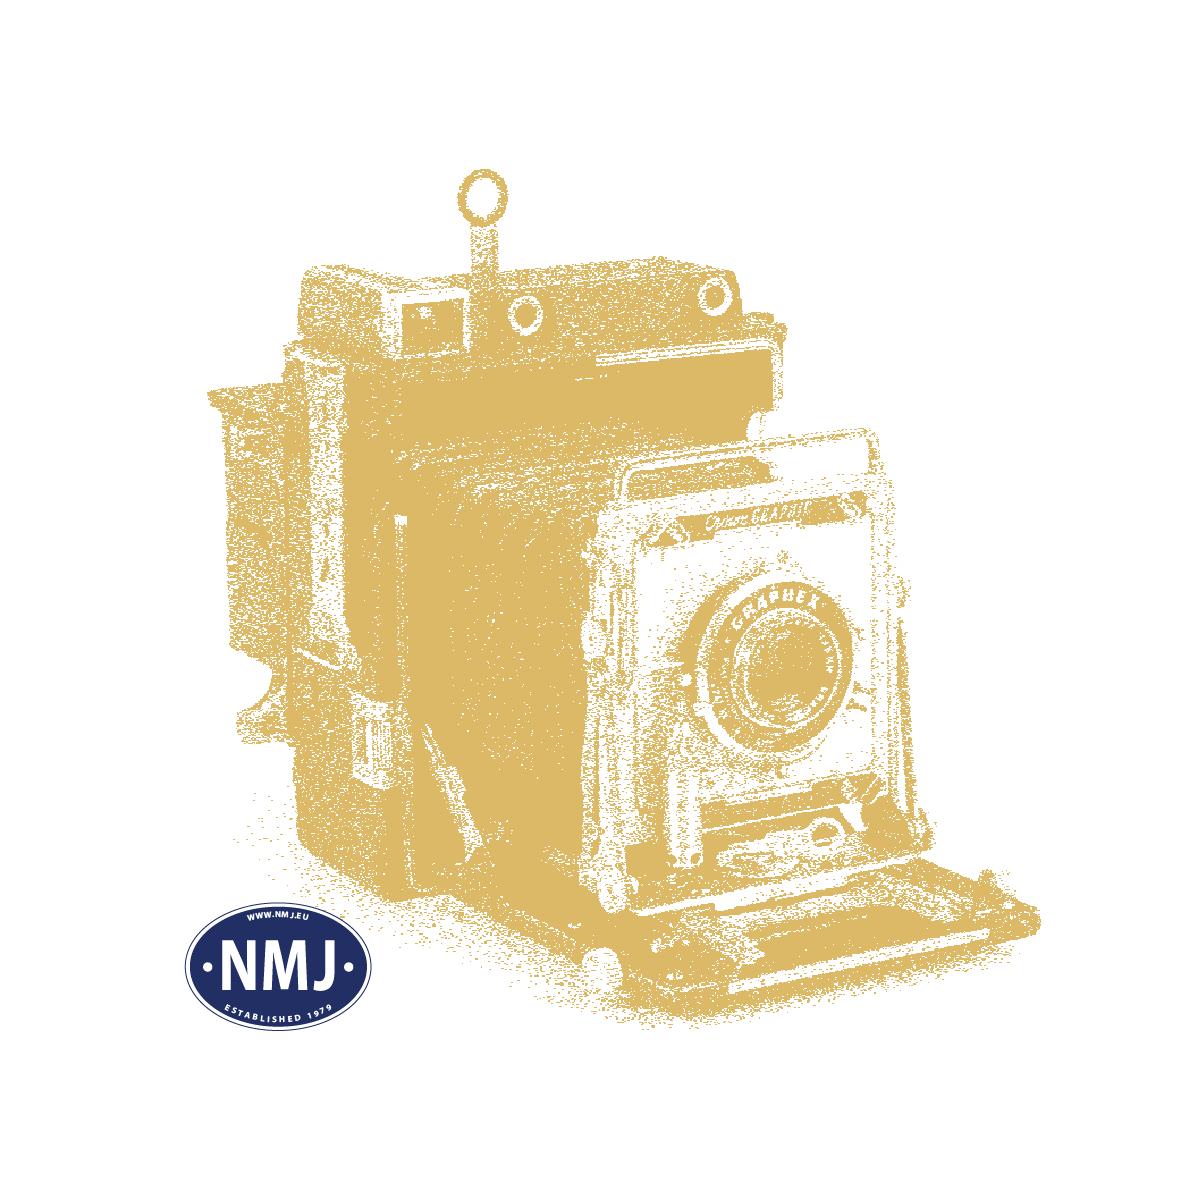 NMJT134.103 - NMJ Topline NSB DF37 21310, Gammeldesign